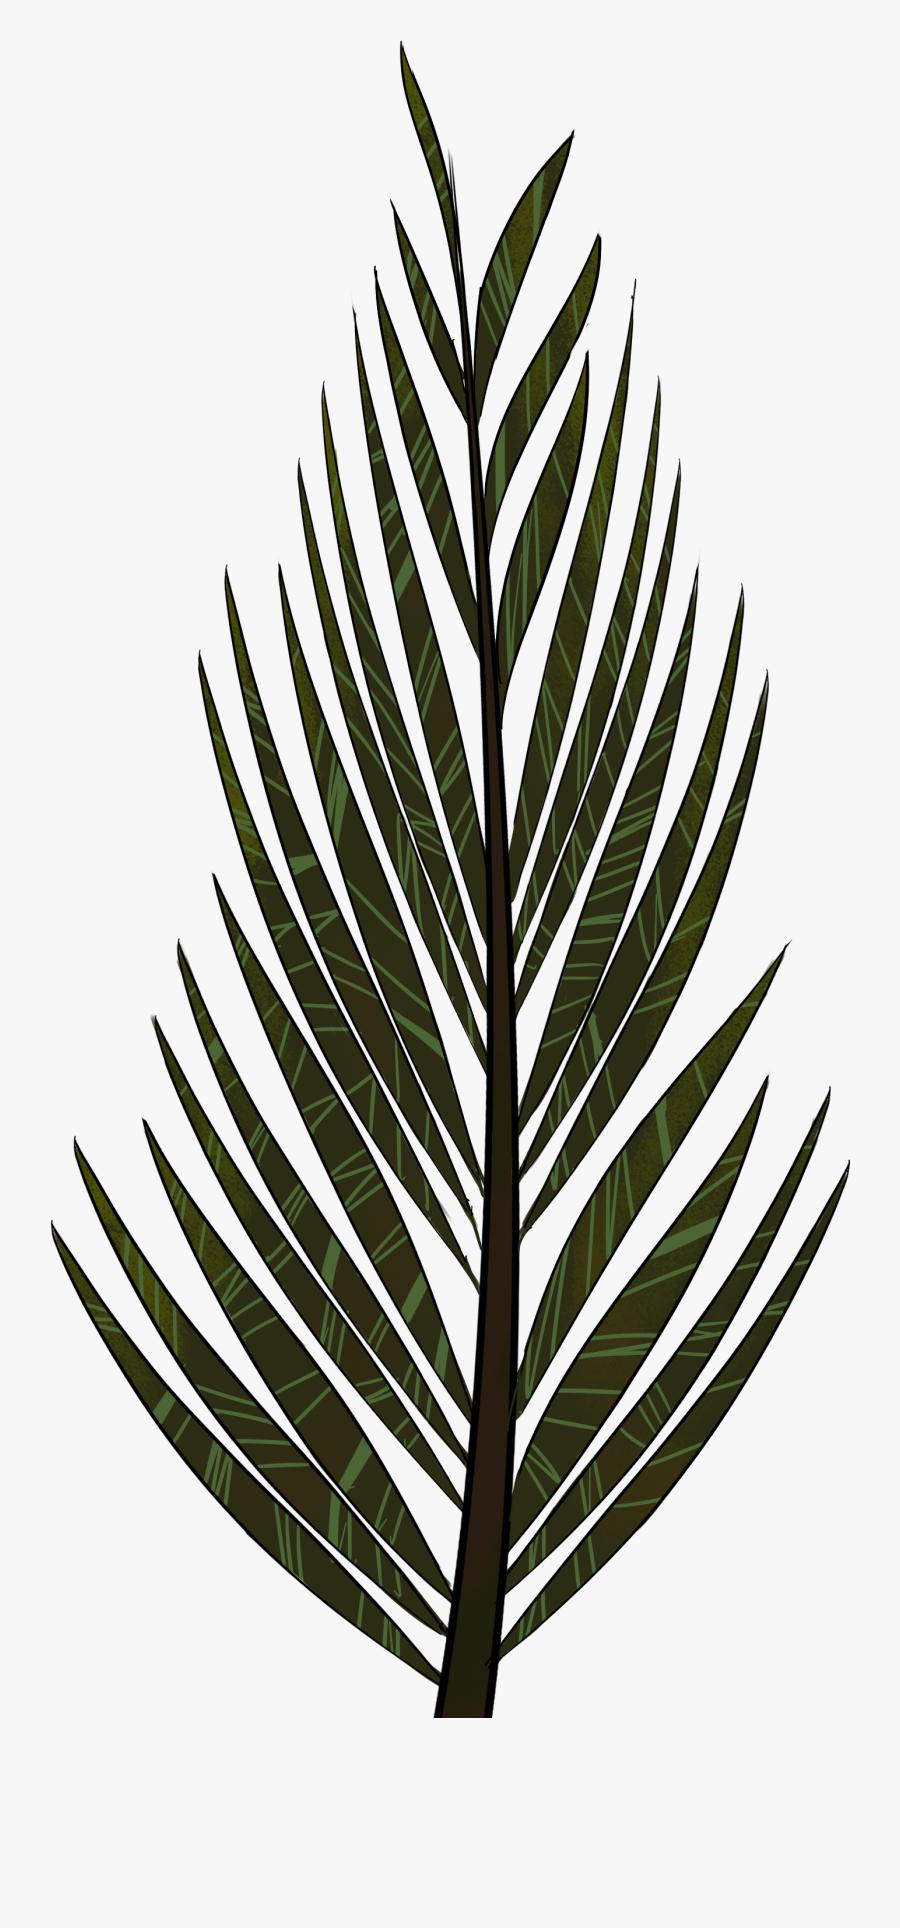 Pine Tree Clipart Fern Tree - Pine Tree Leaves Draw, Transparent Clipart